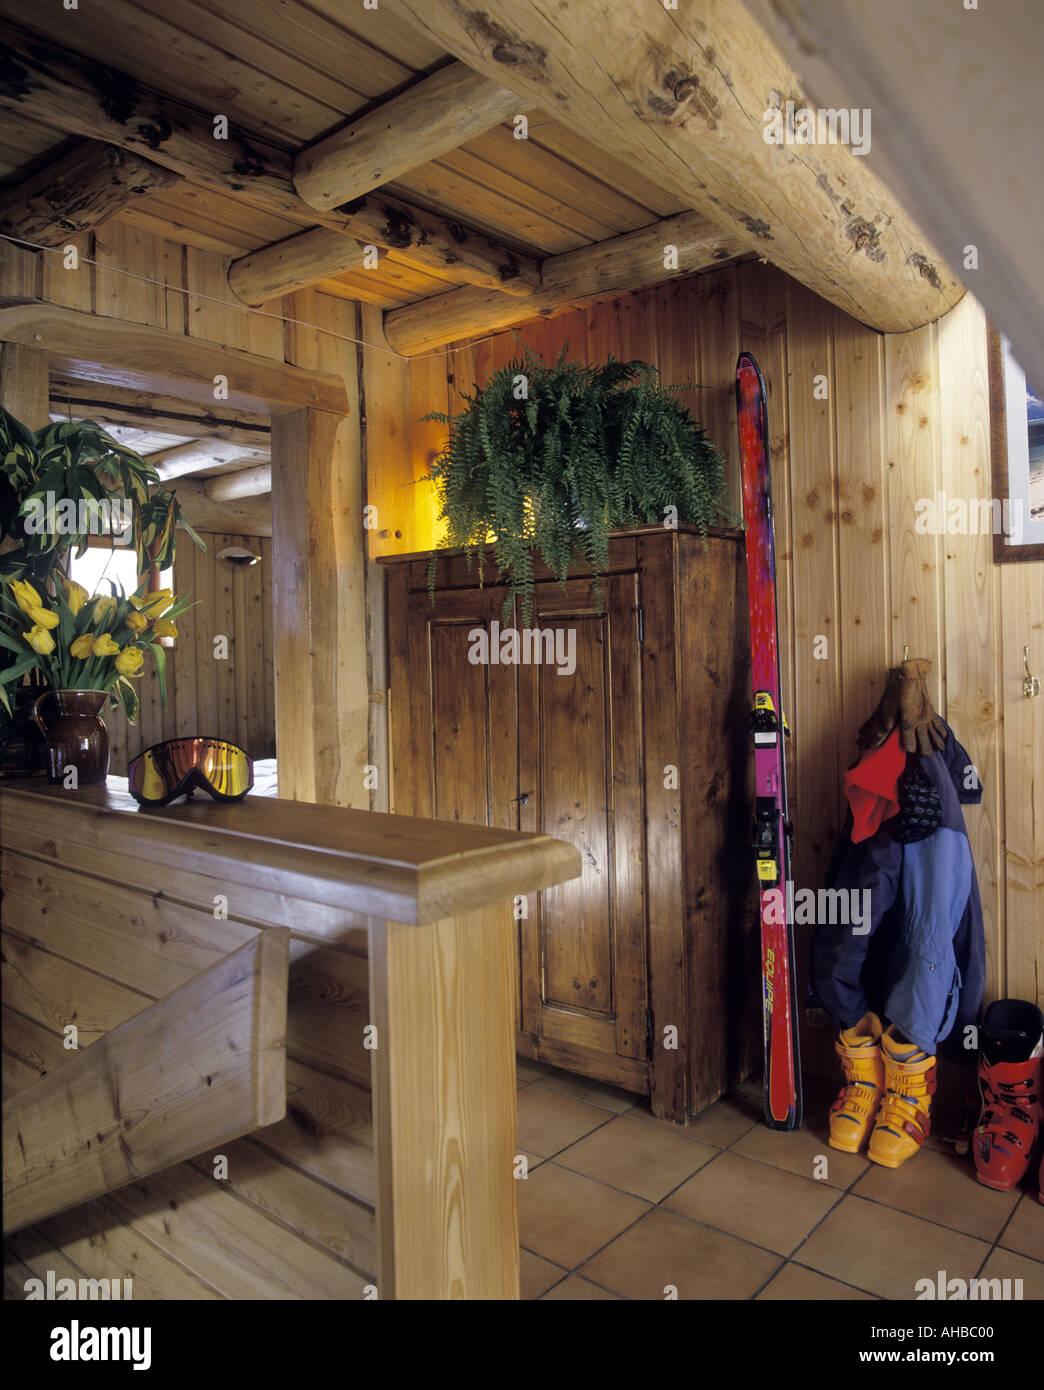 Ski Chalet Interior Stockfotos & Ski Chalet Interior Bilder - Alamy